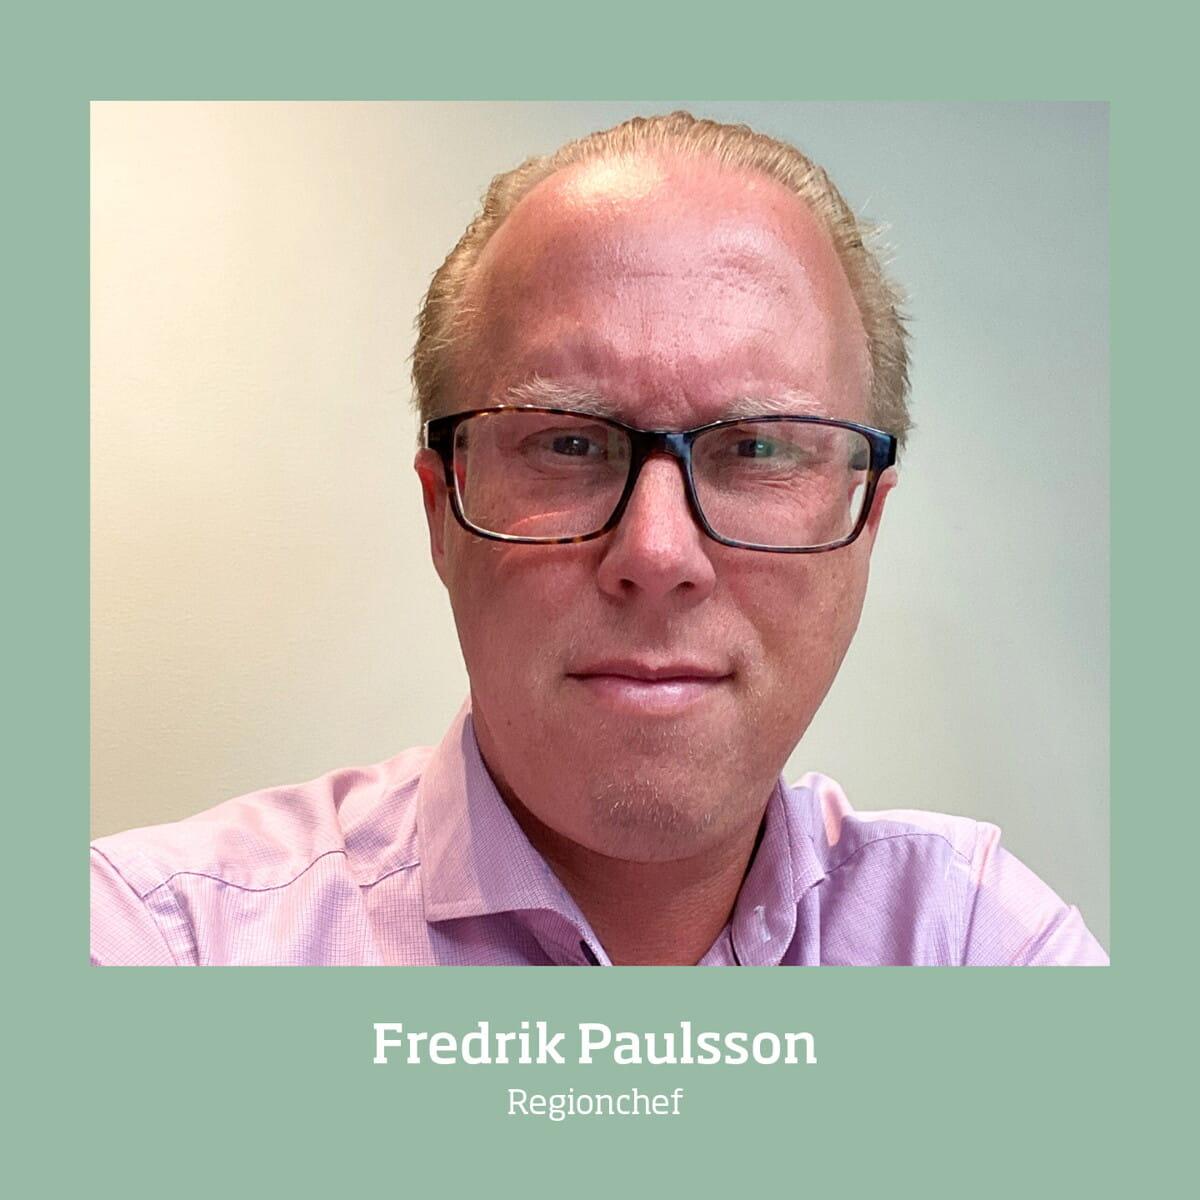 Fredrik Paulsson.jpg